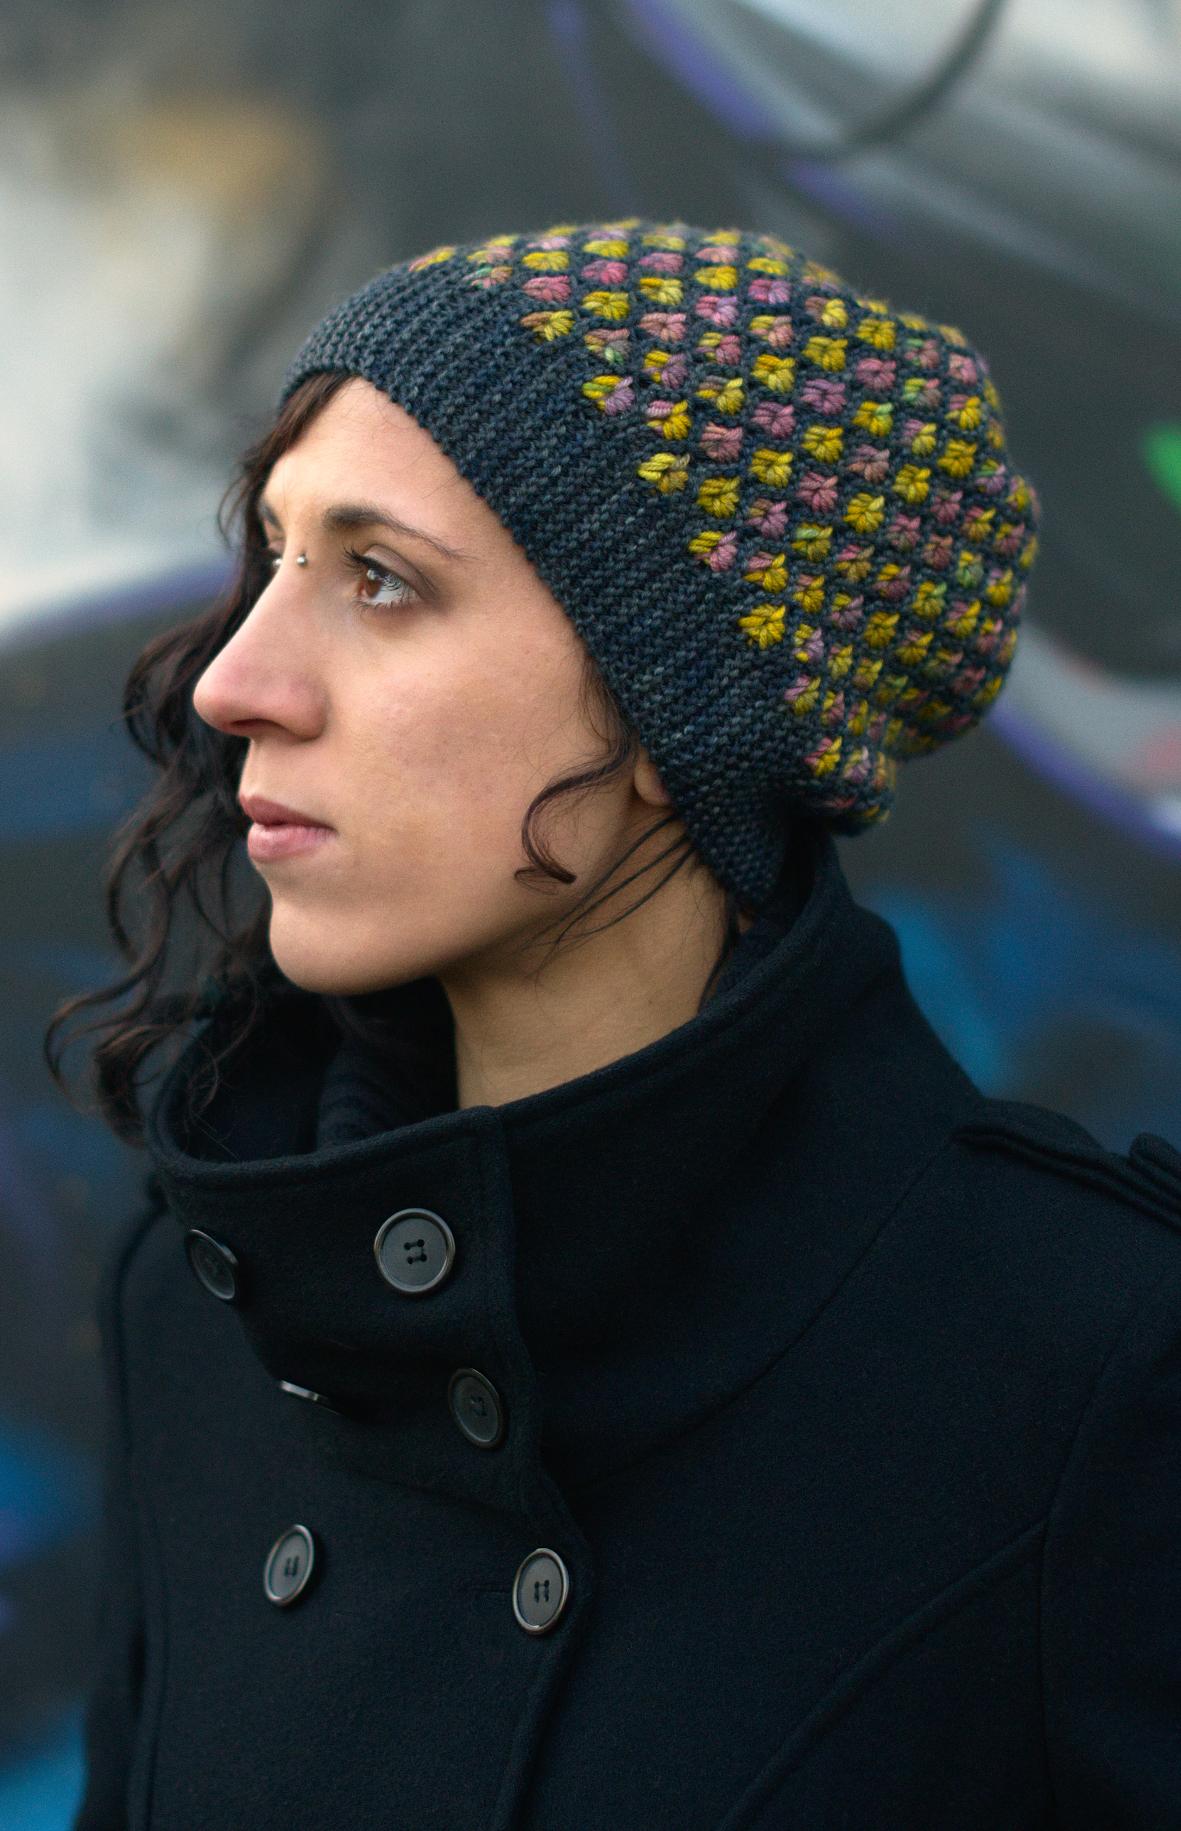 Klastar sideways knit cluster and slipped stitch colourwork Hat hand knitting pattern for DK yarn